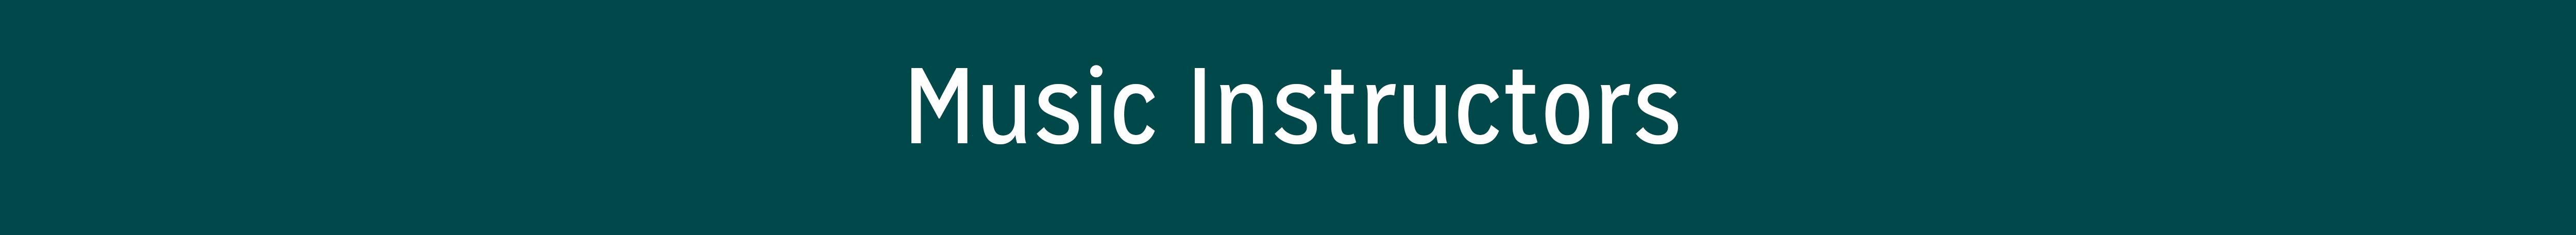 musicinstructors_header